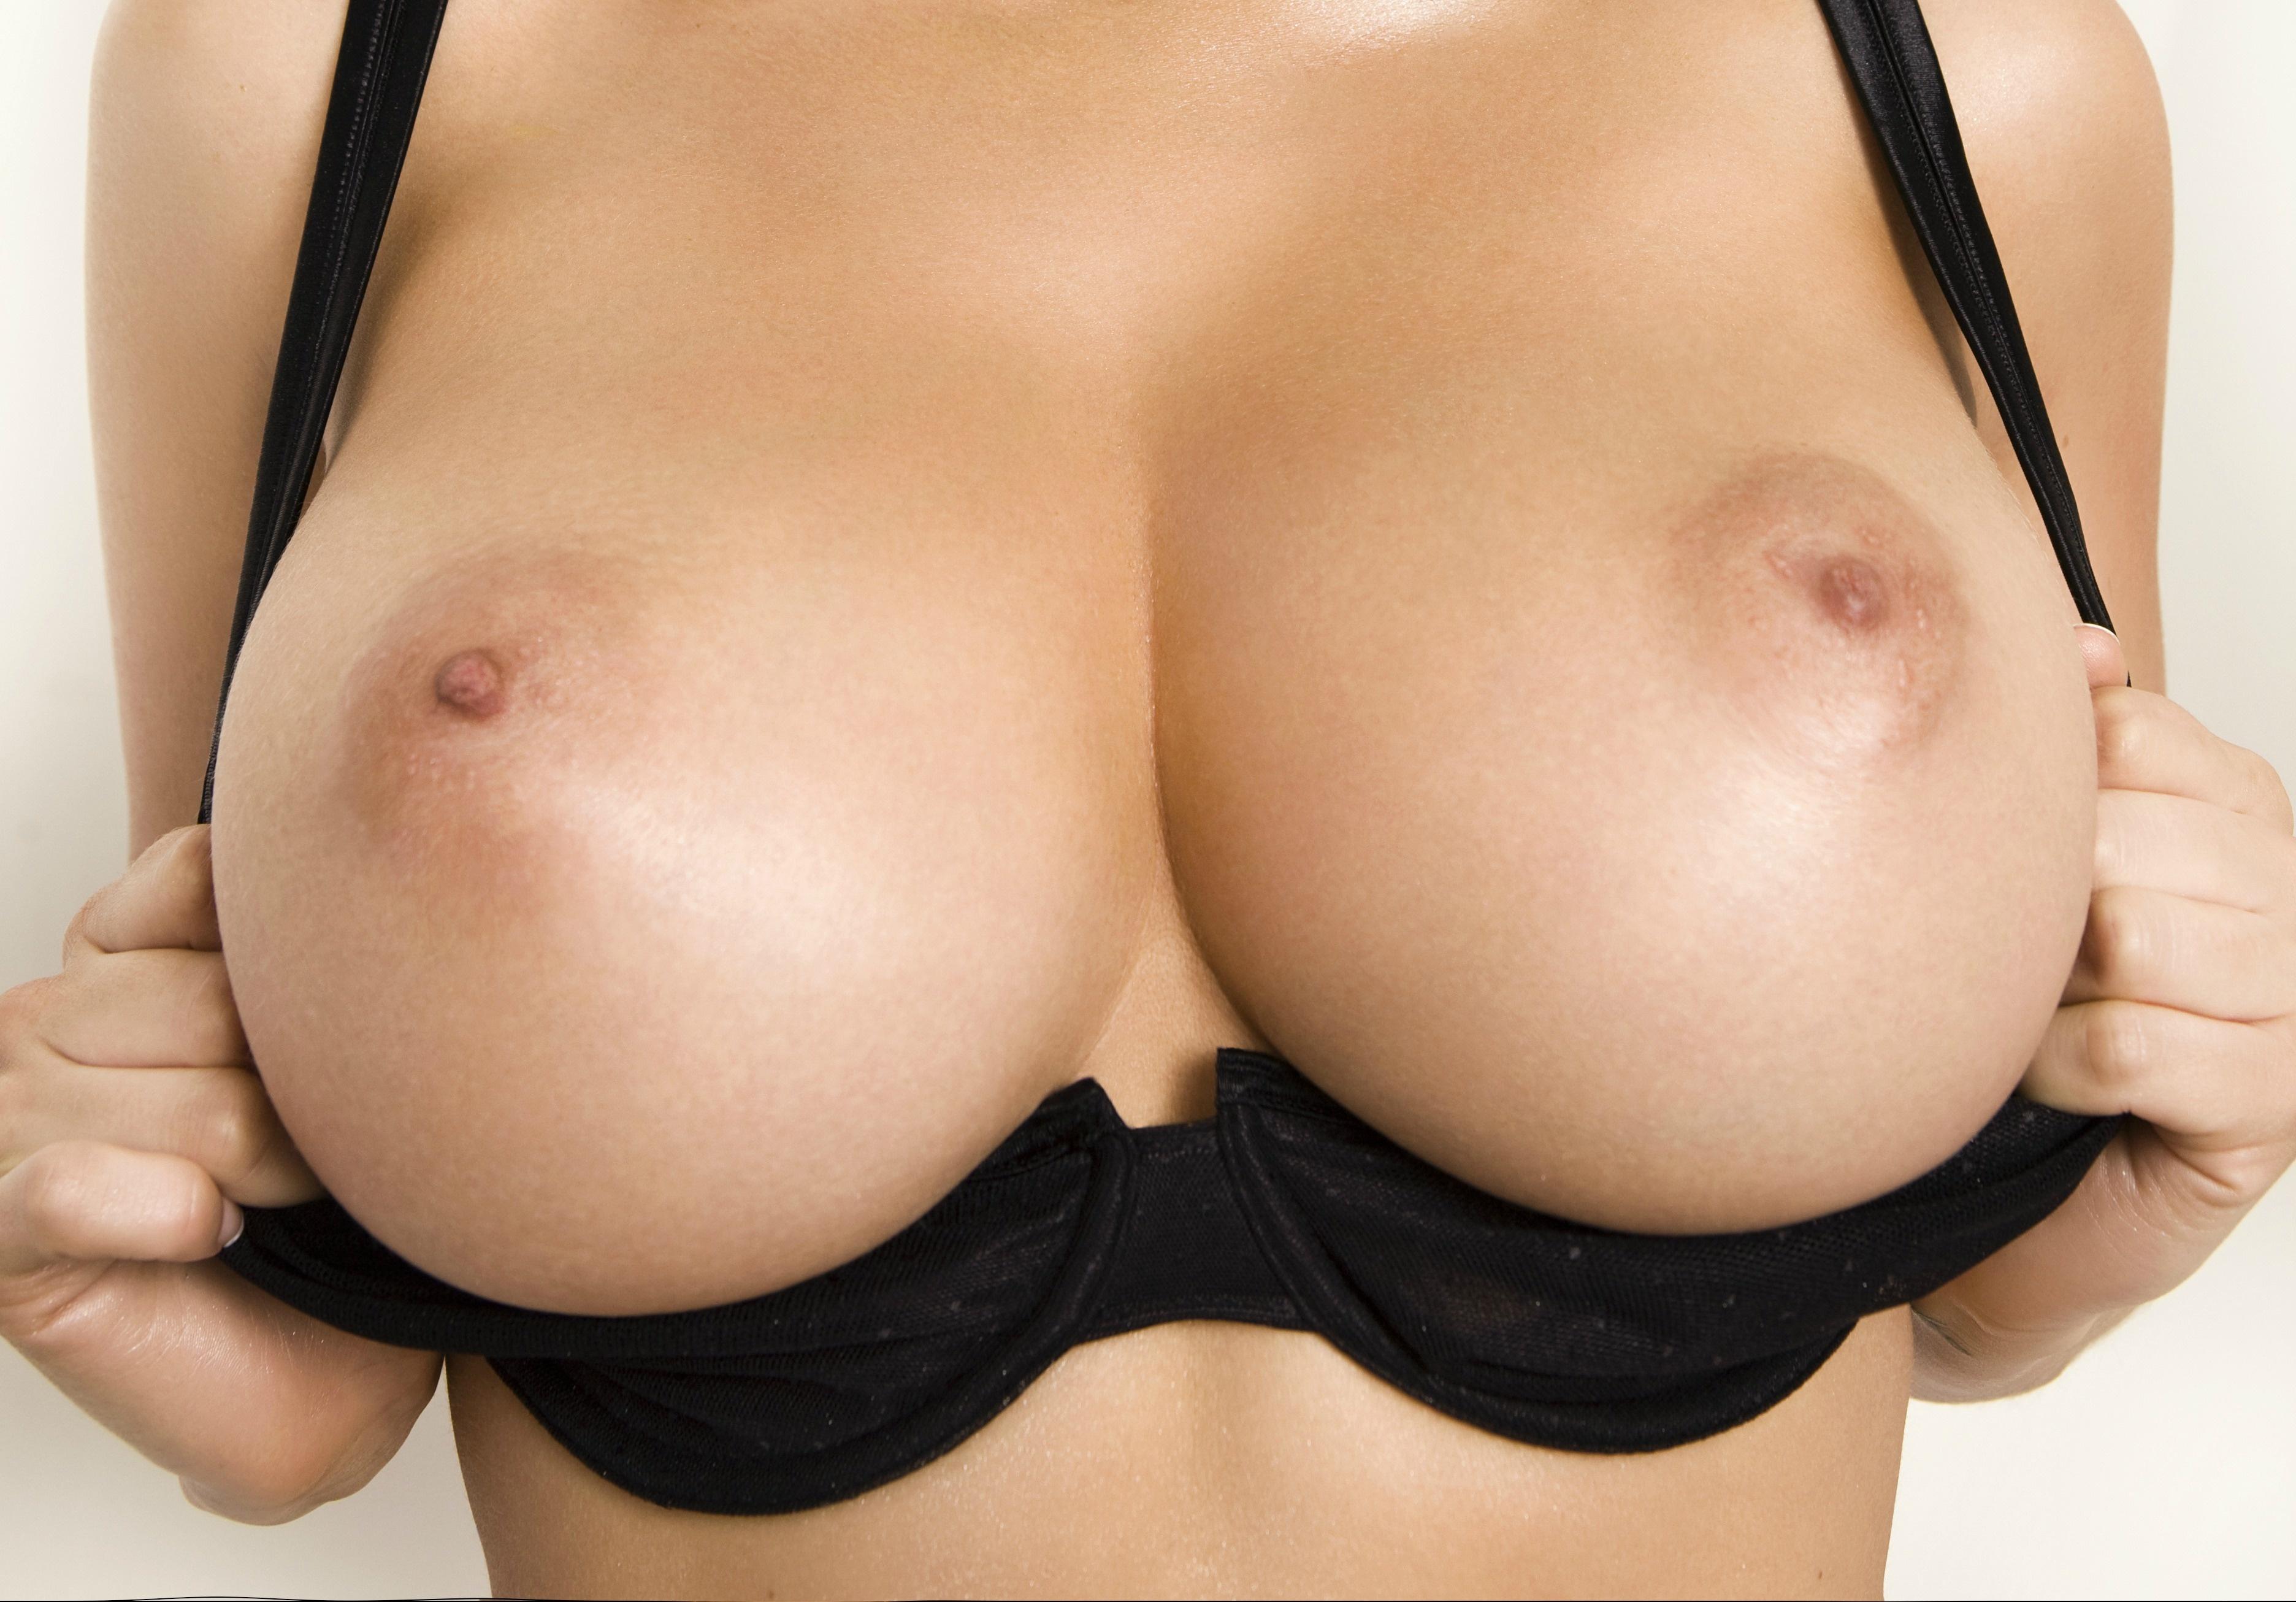 Big Tits Glamour Pics